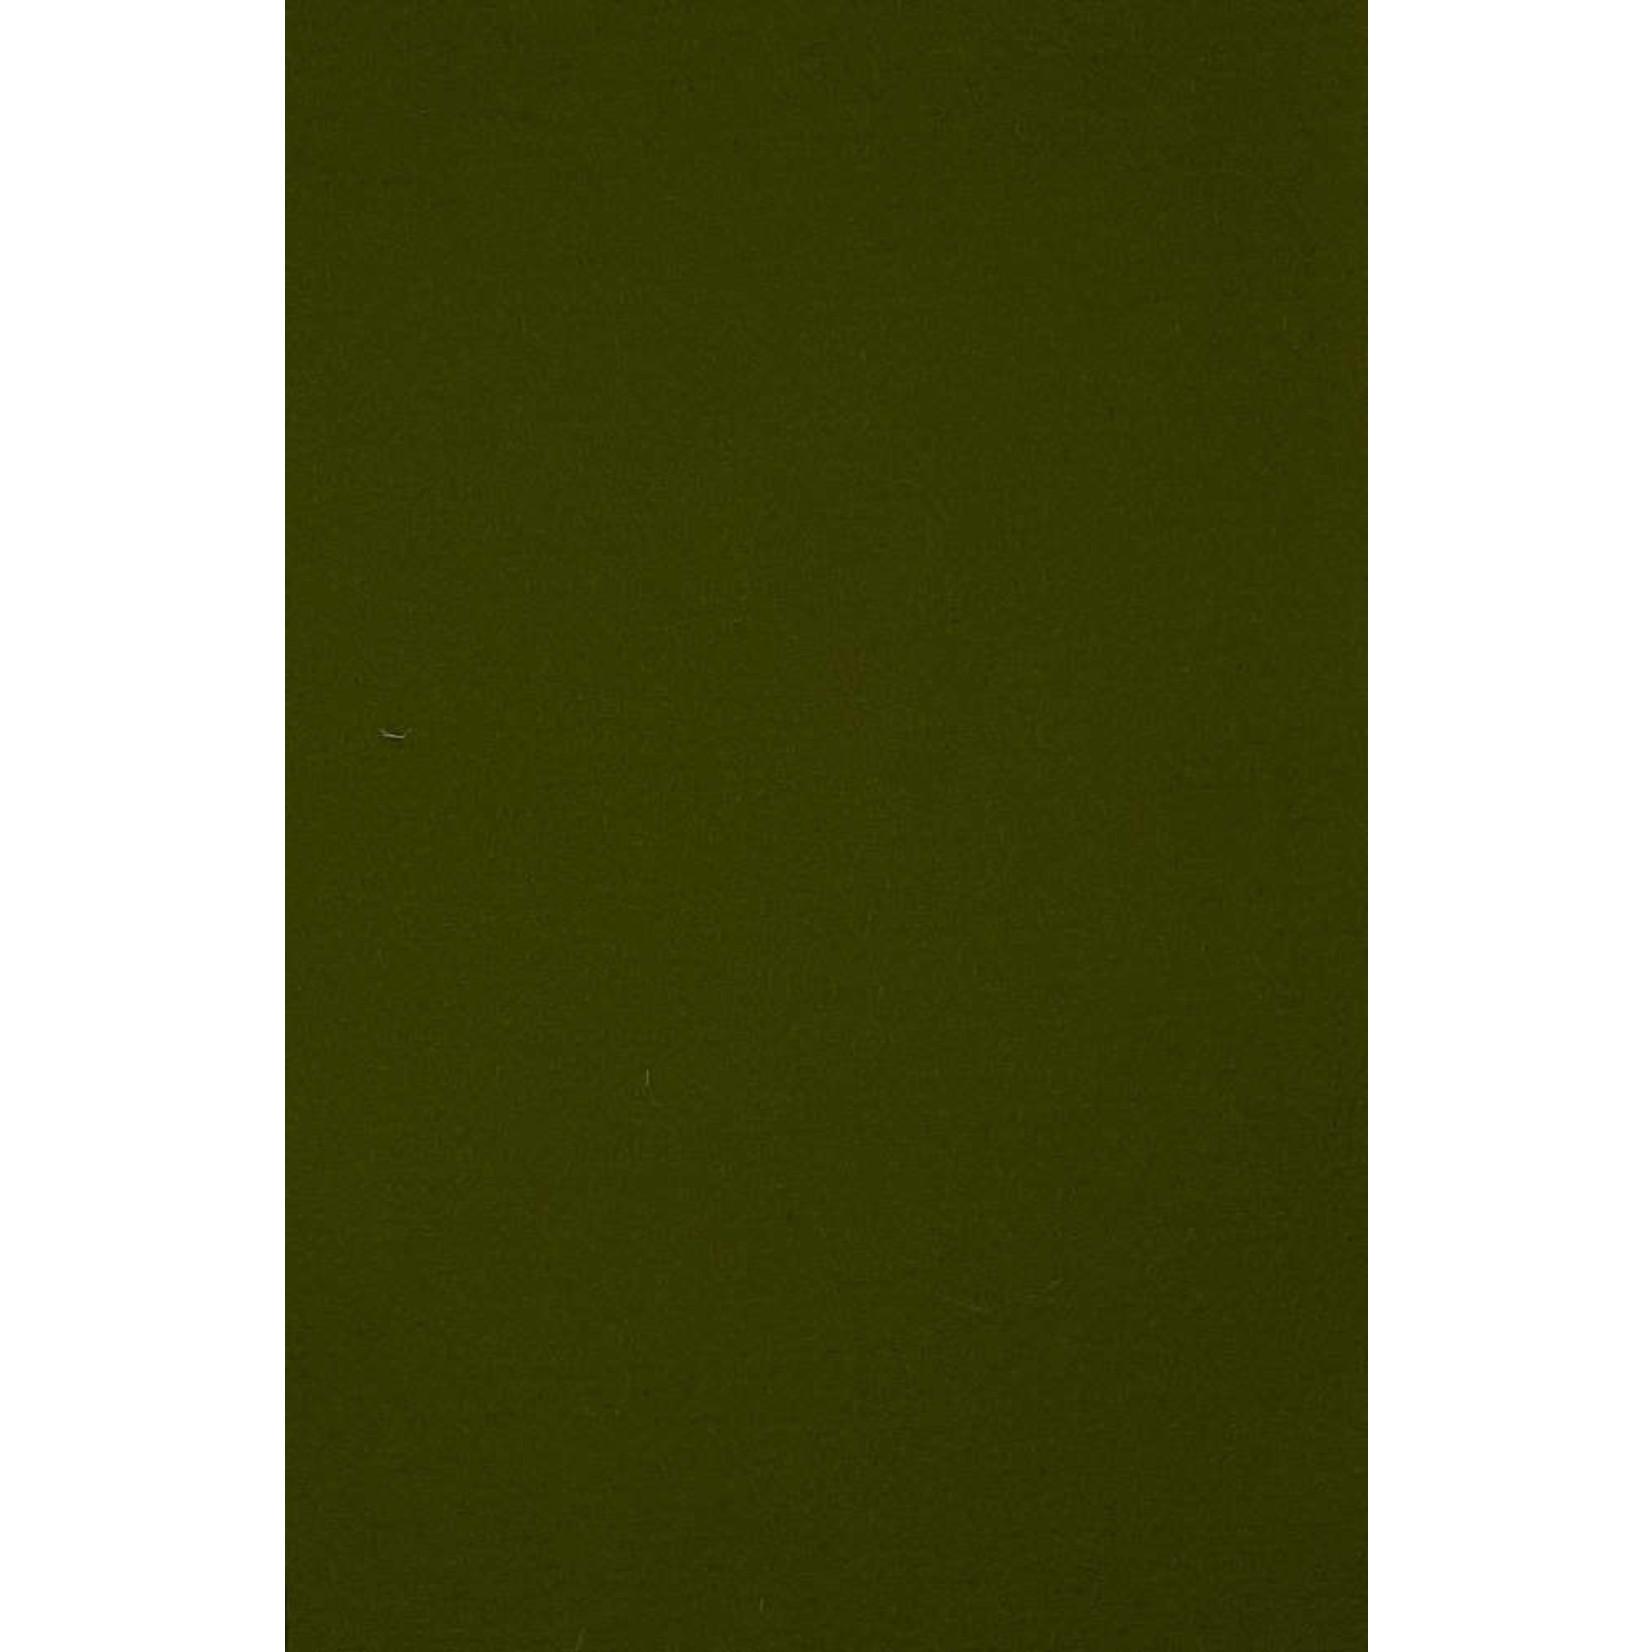 HollandFelt Wolvilt - lapje 20 x 30 cm. - kleur 14 - Olijfgroen - zuiver scheerwol- 1 mm. dik